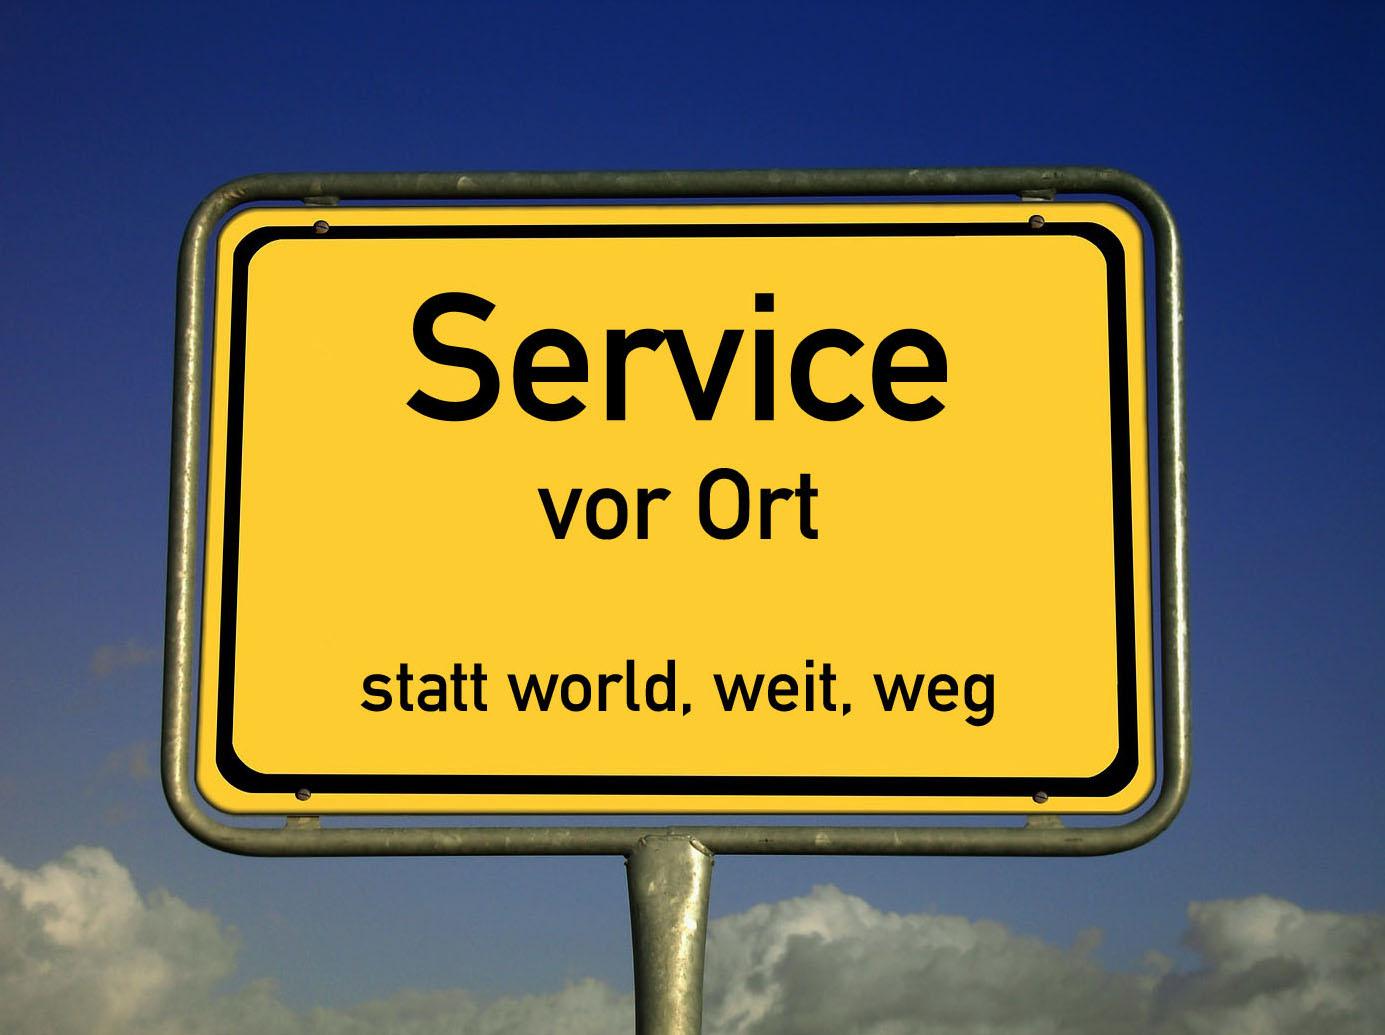 Service vor Ort